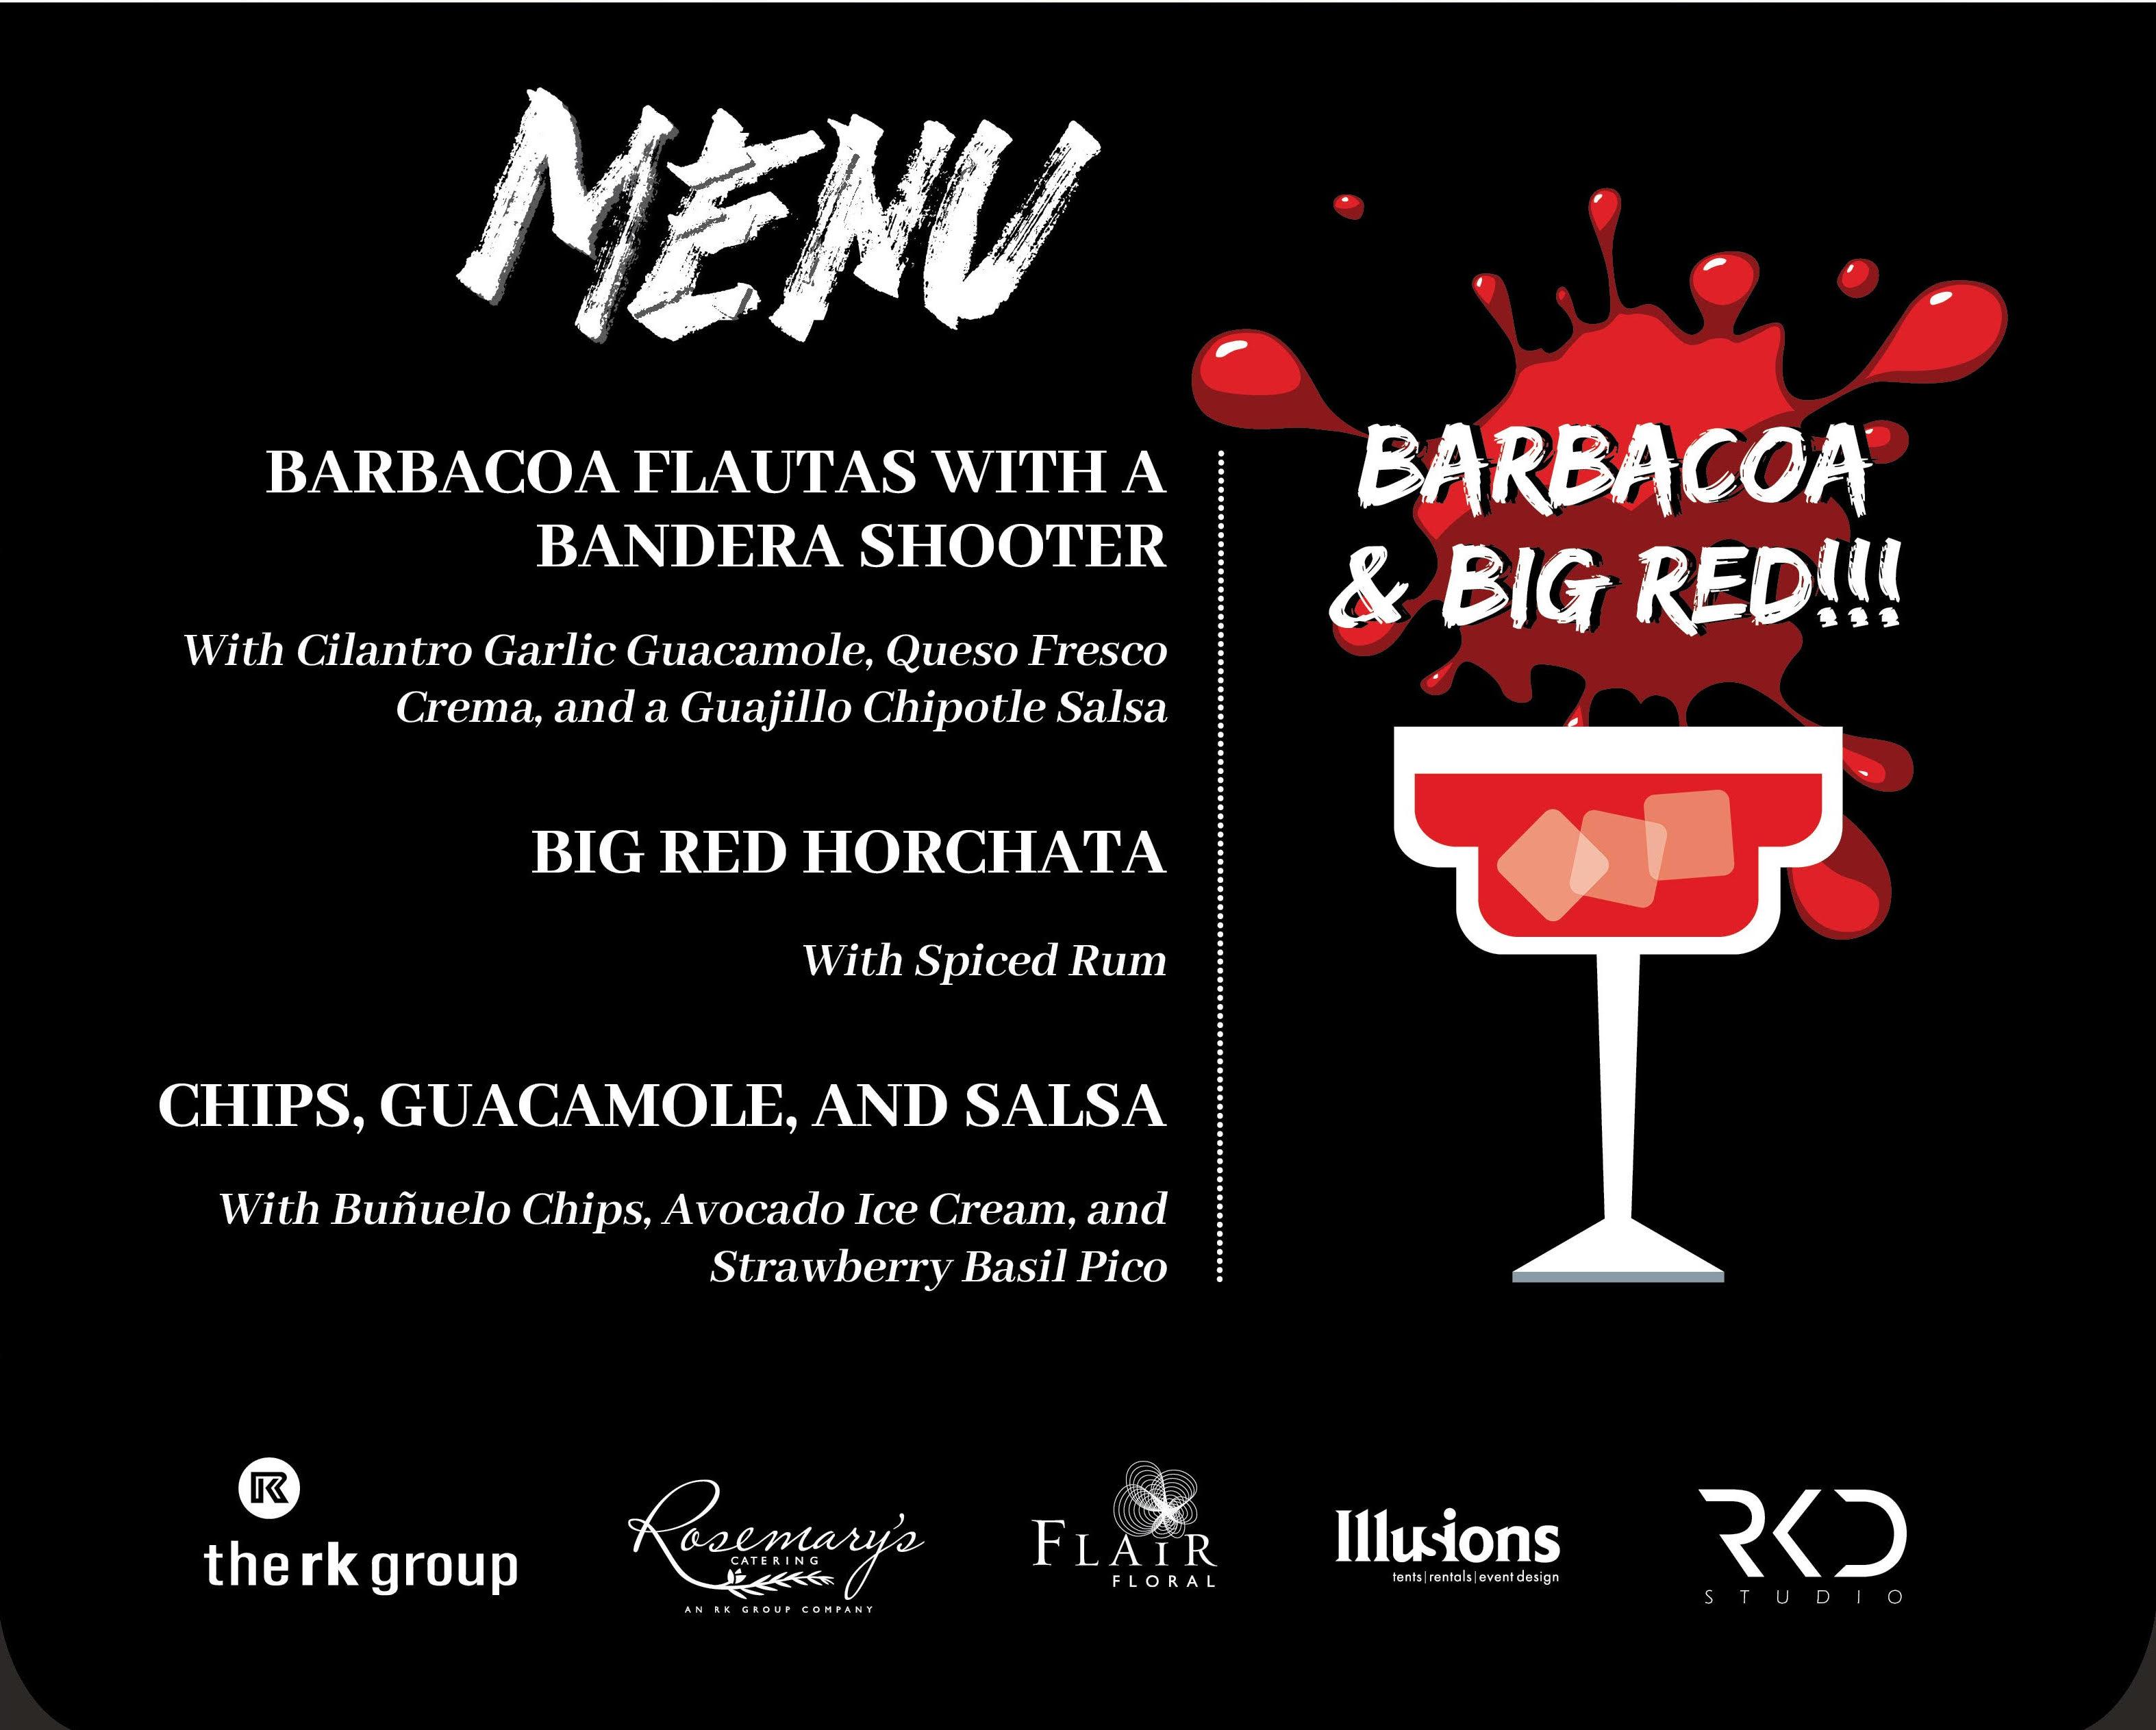 Menu Design for Baracoa & Big red